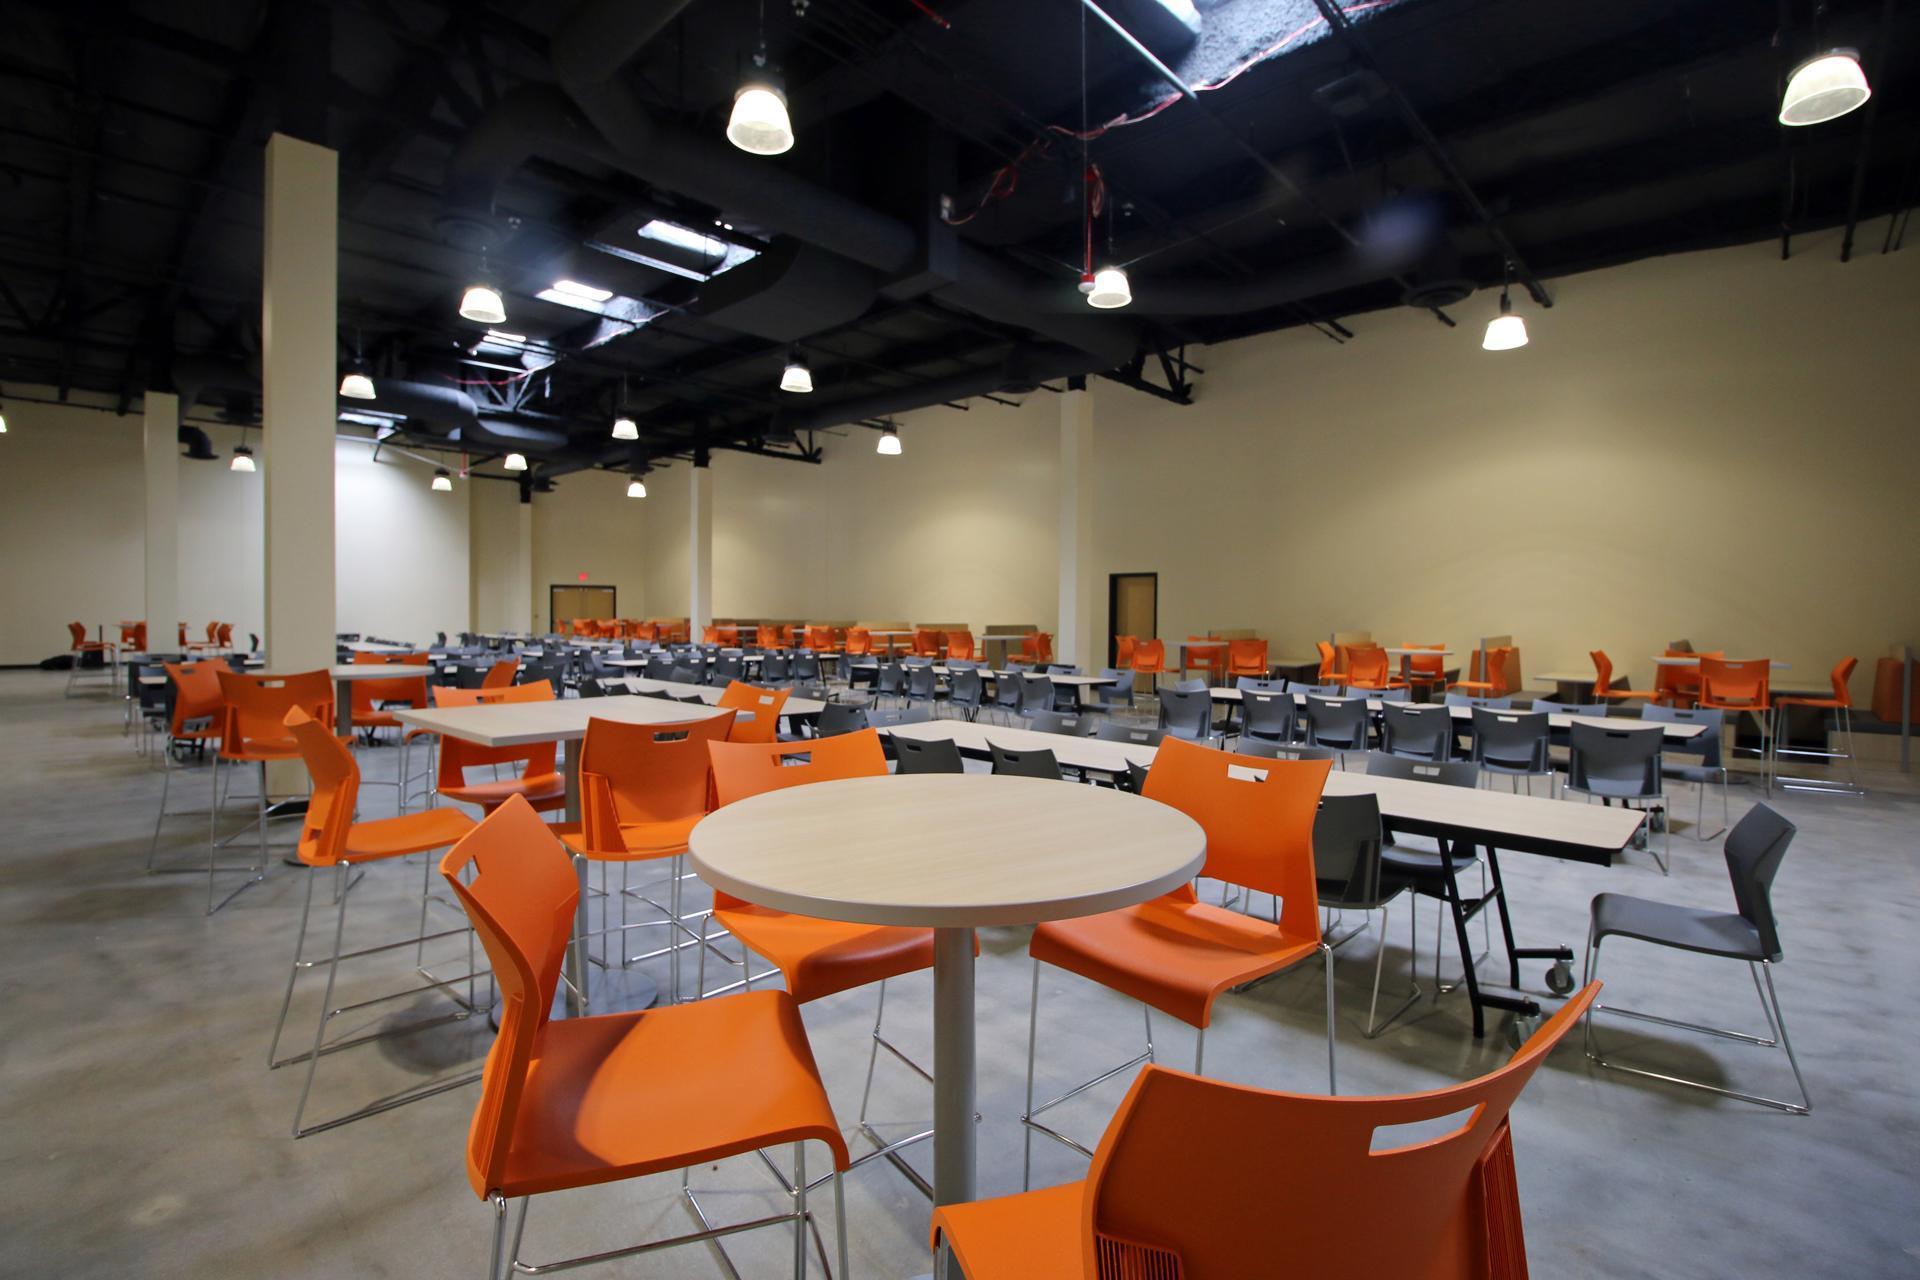 eHS cafeteria